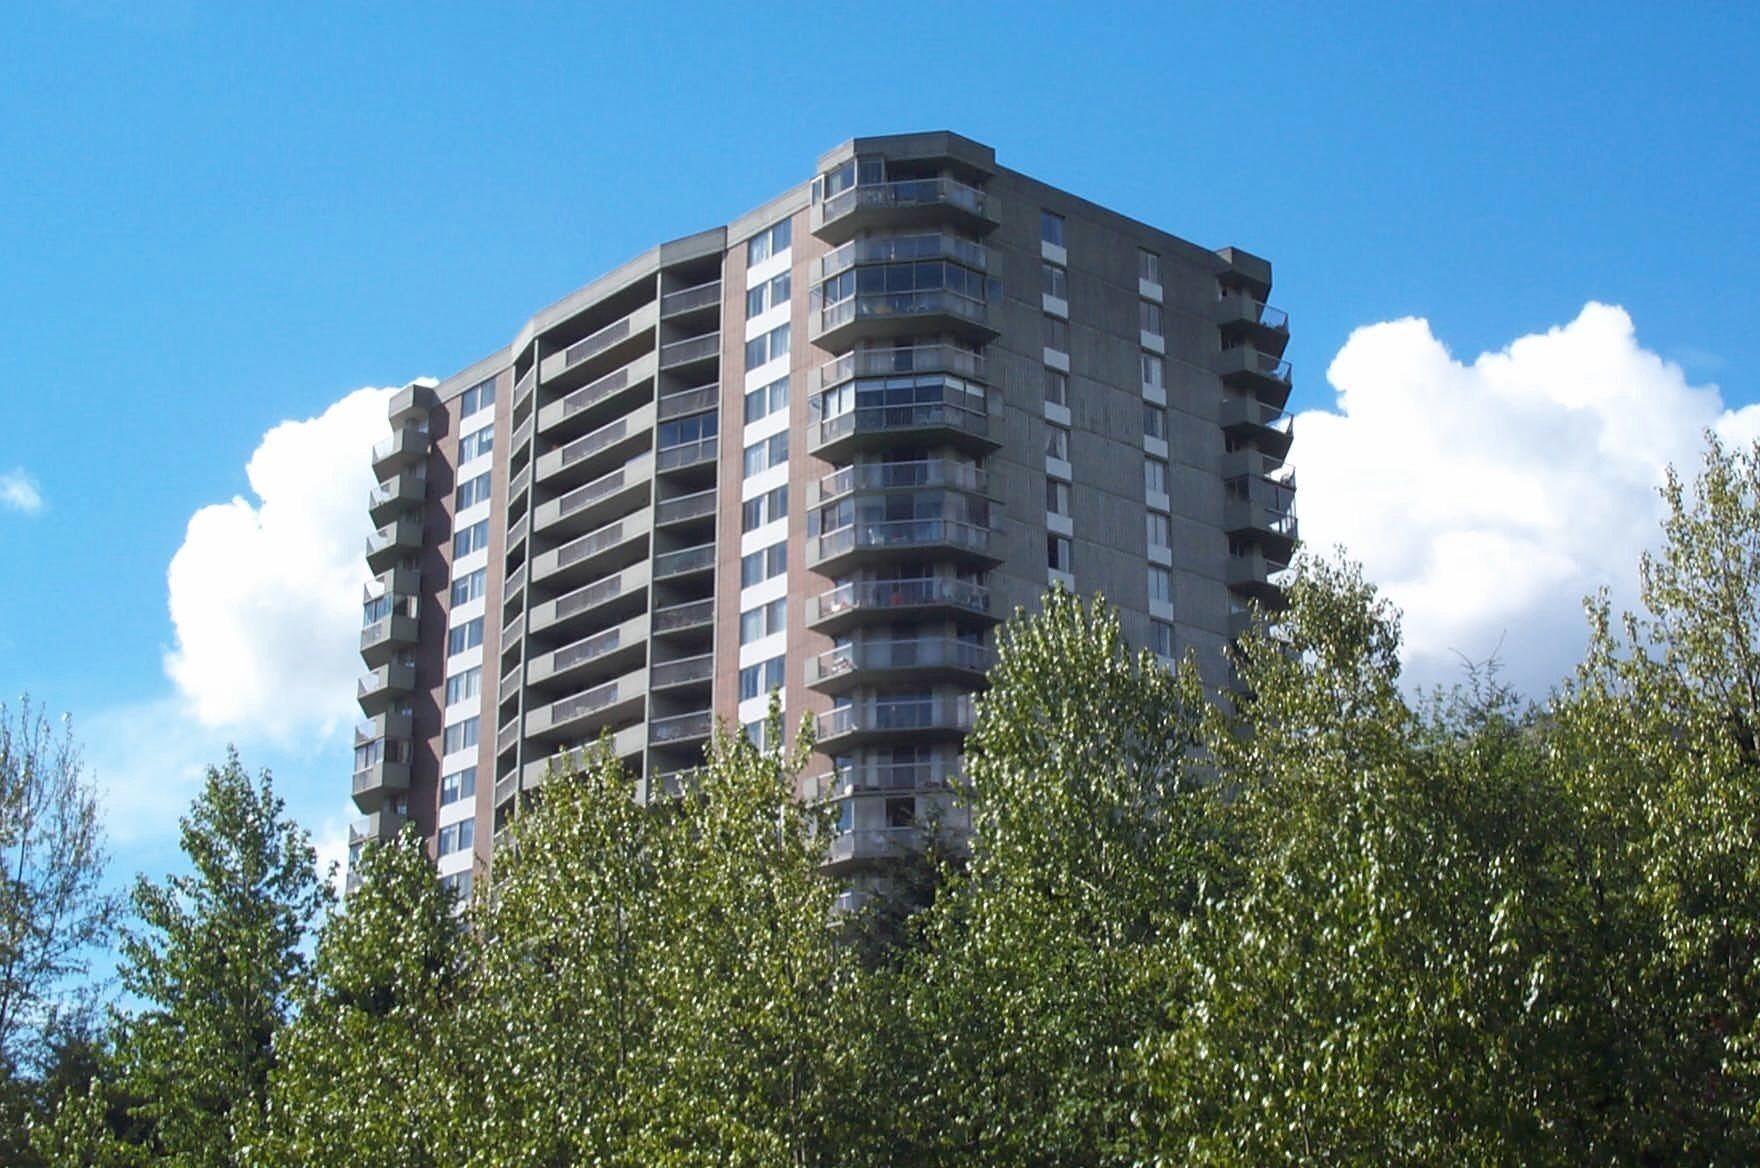 1010 2024 FULLERTON AVENUE - Pemberton NV Apartment/Condo for sale, 1 Bedroom (R2625514) - #1